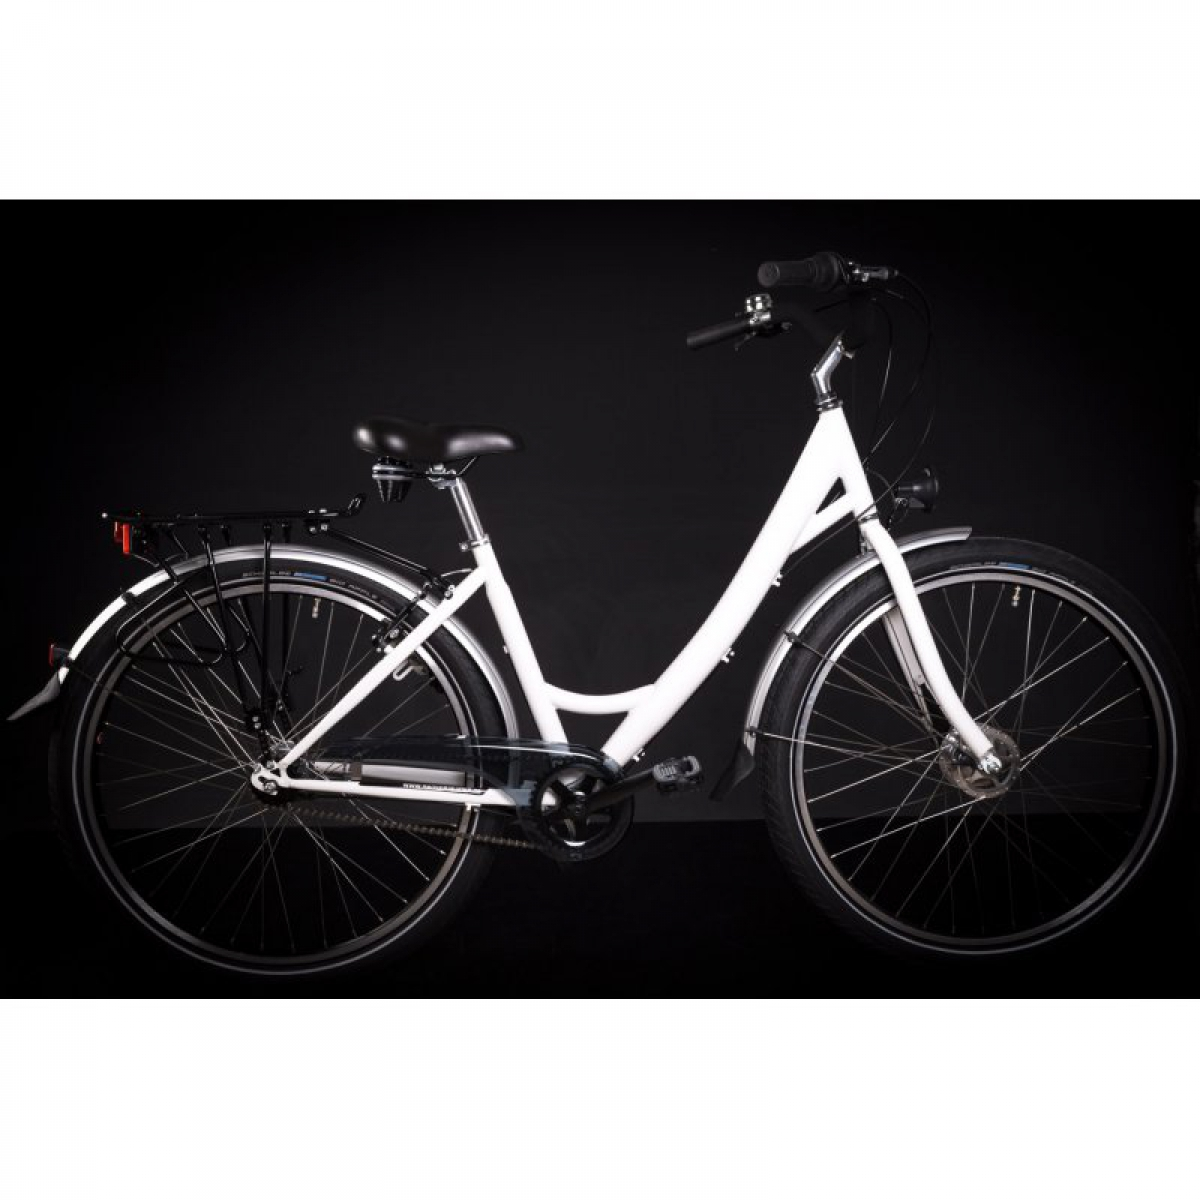 28 zoll damen rad fahrrad city fahrrad rent bike shimano nexus 7 gang xxl weiss ebay. Black Bedroom Furniture Sets. Home Design Ideas